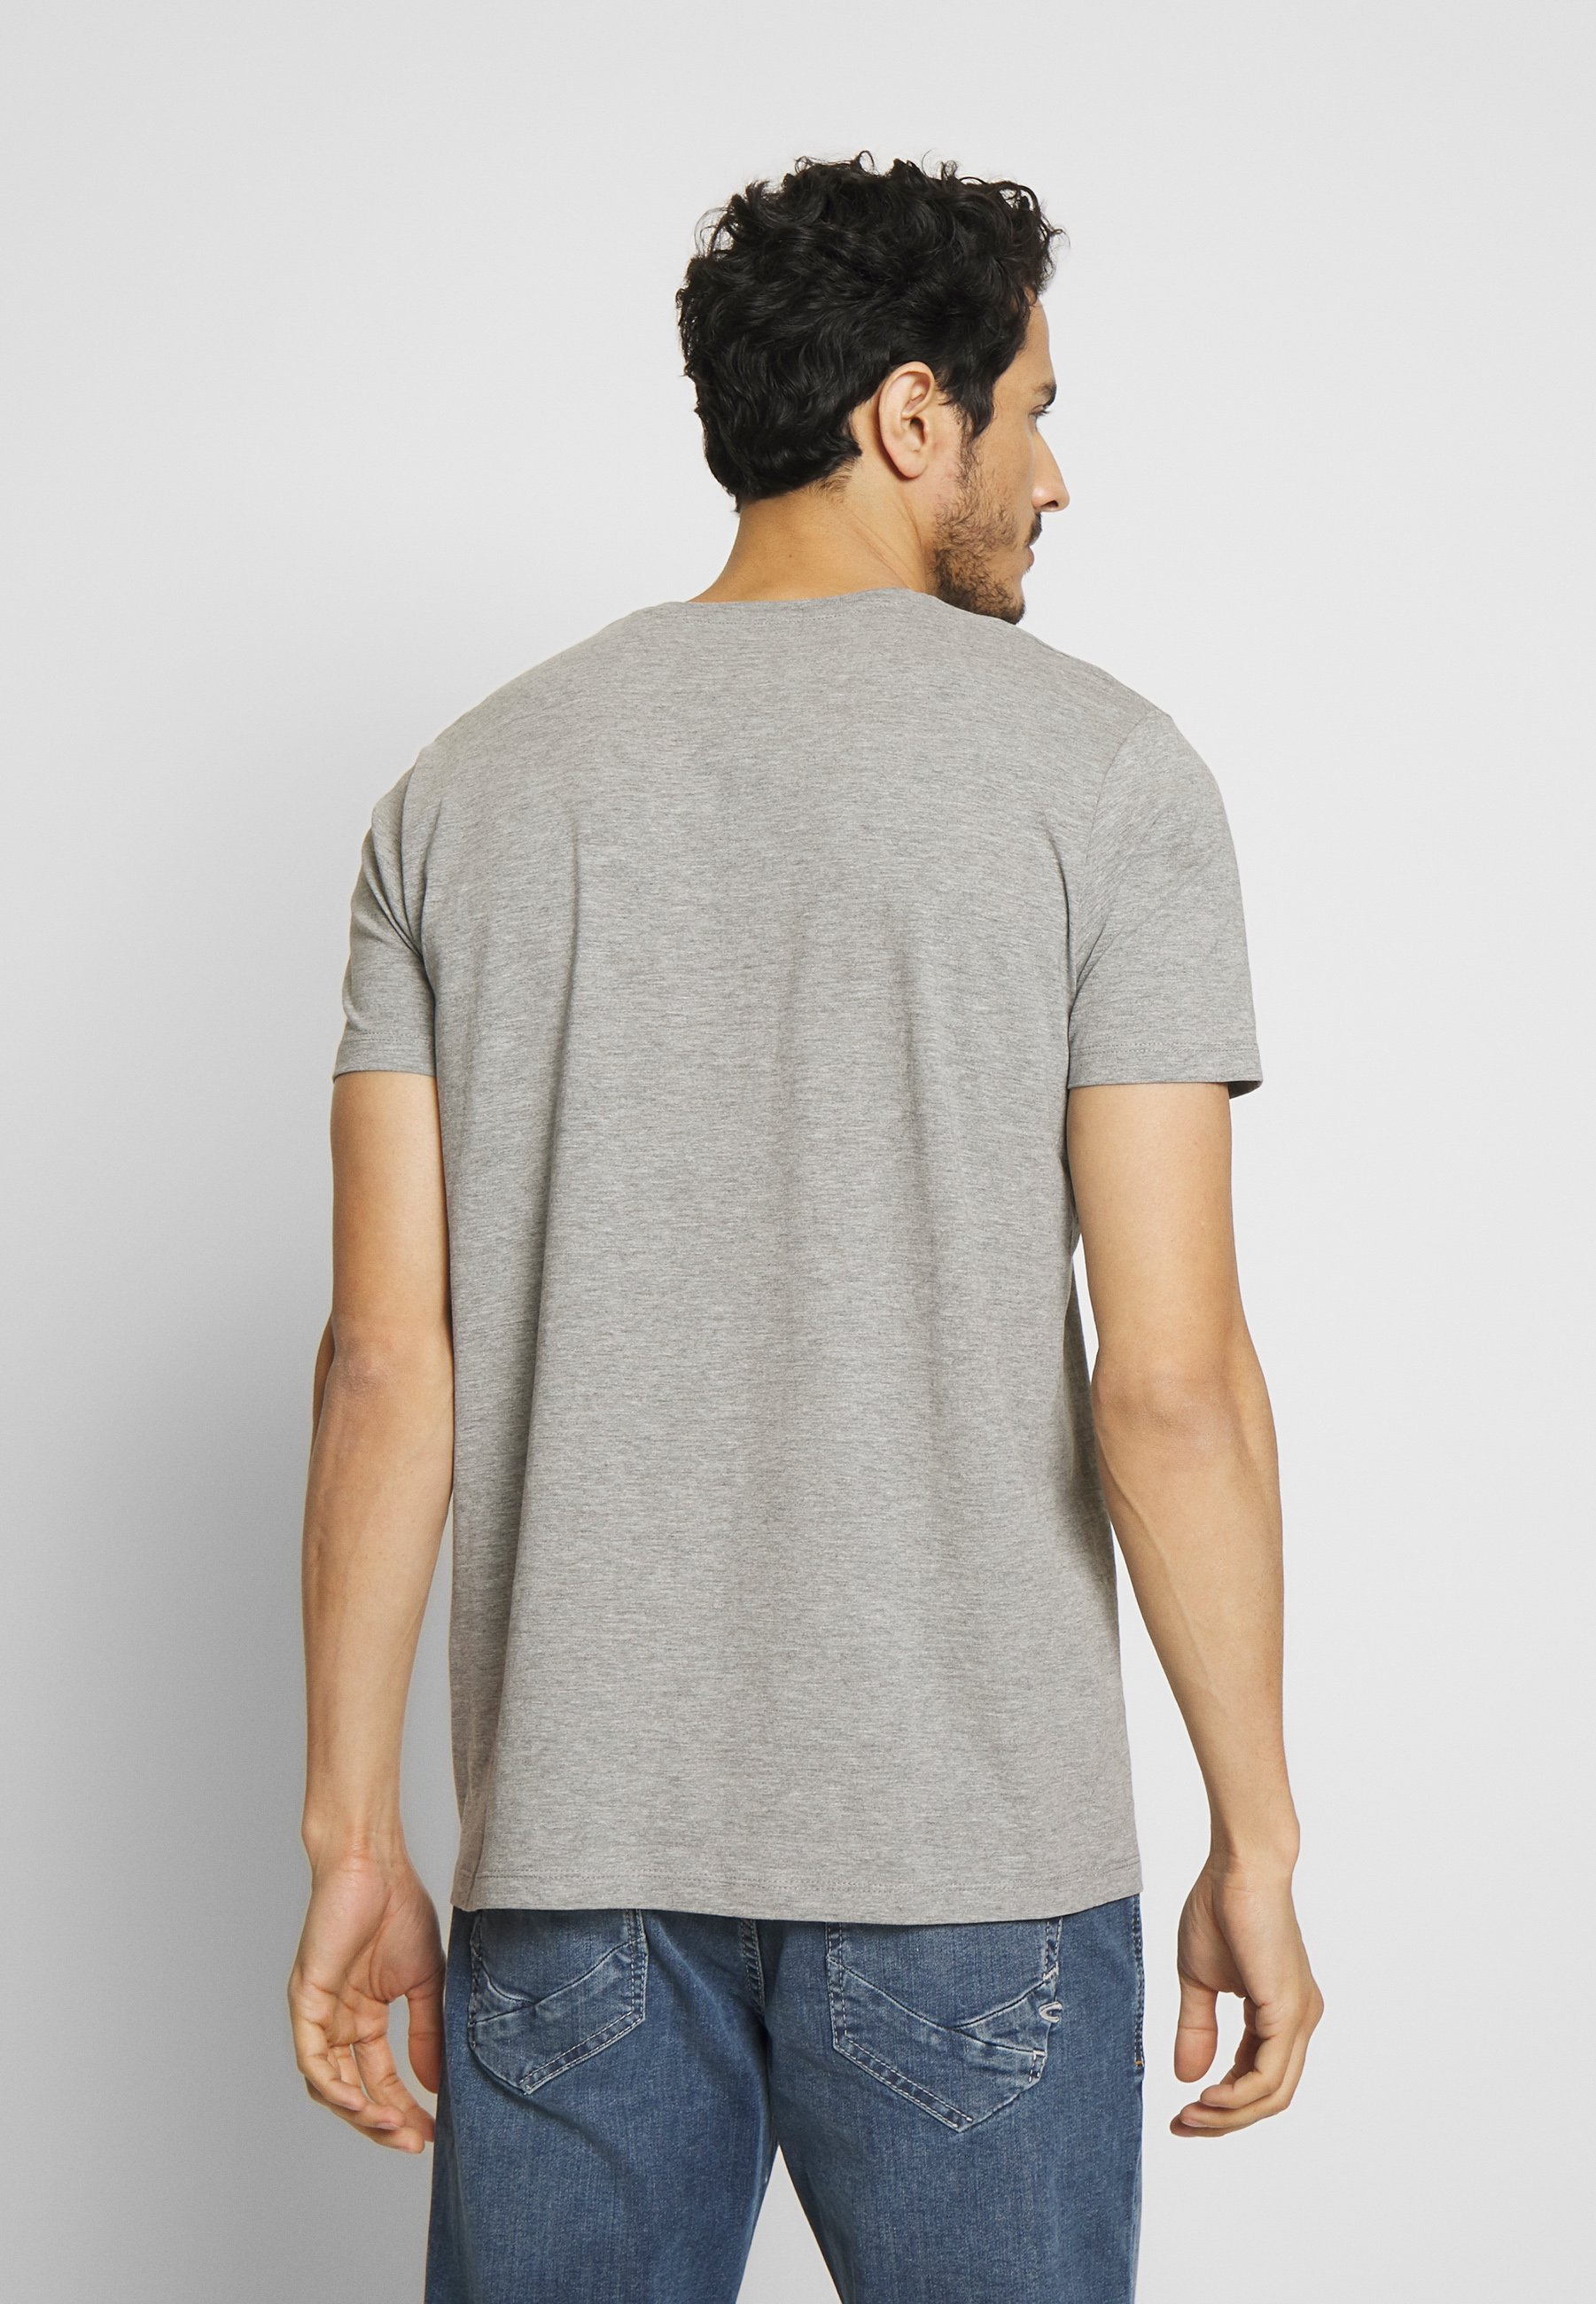 Esprit T-shirt Imprimé - Medium Grey